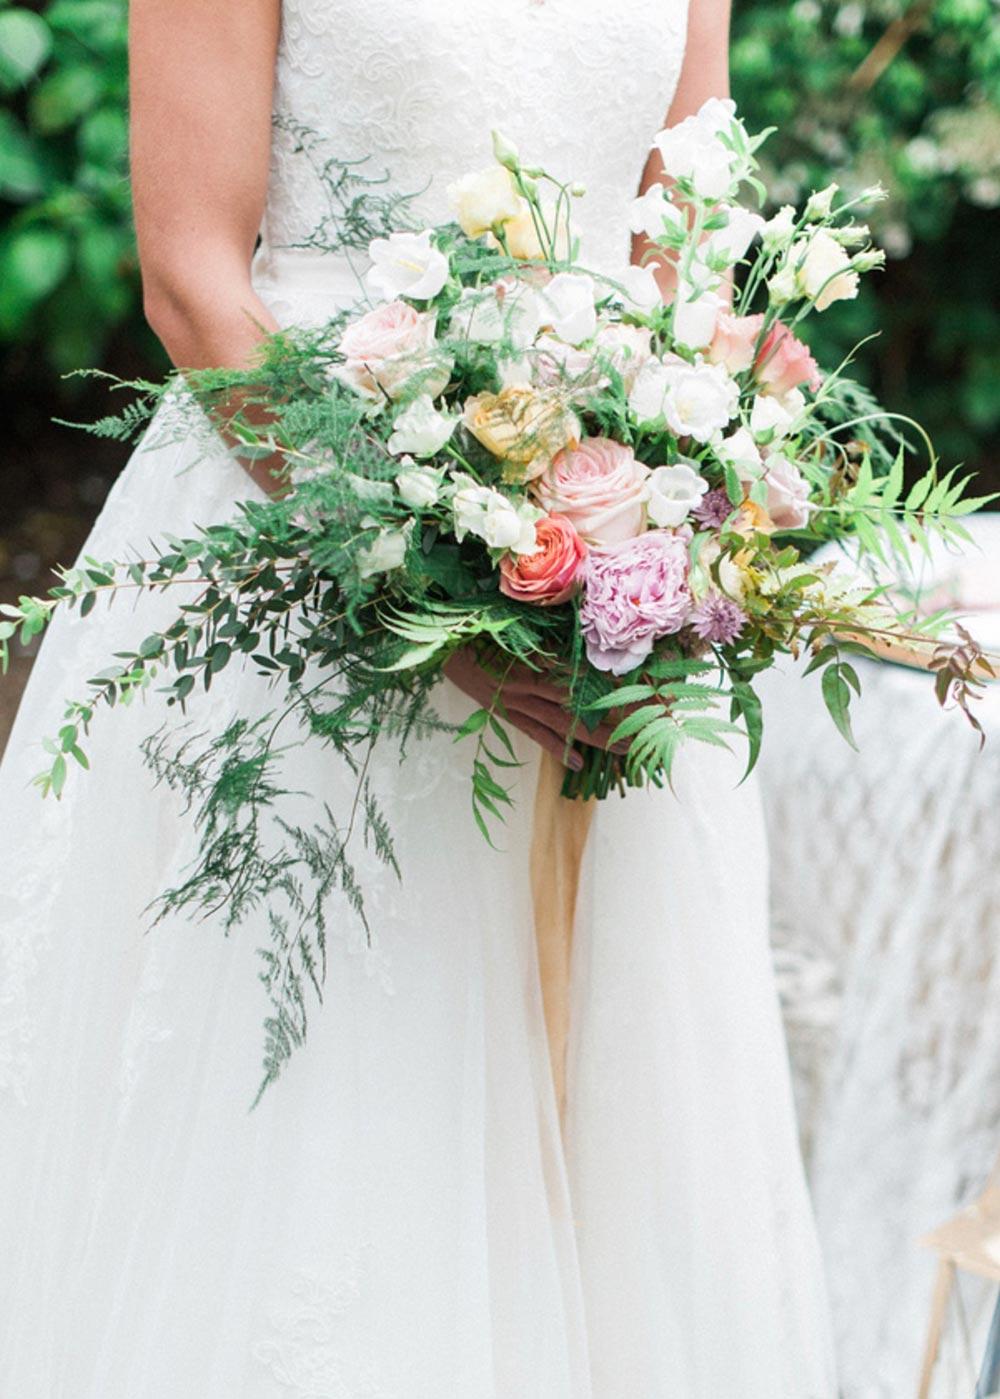 3-wilde-thyme-bridal-bouquet-peonies-garden-roses-silk-ribbon-wedding-flowers-luxury-flowers.jpg